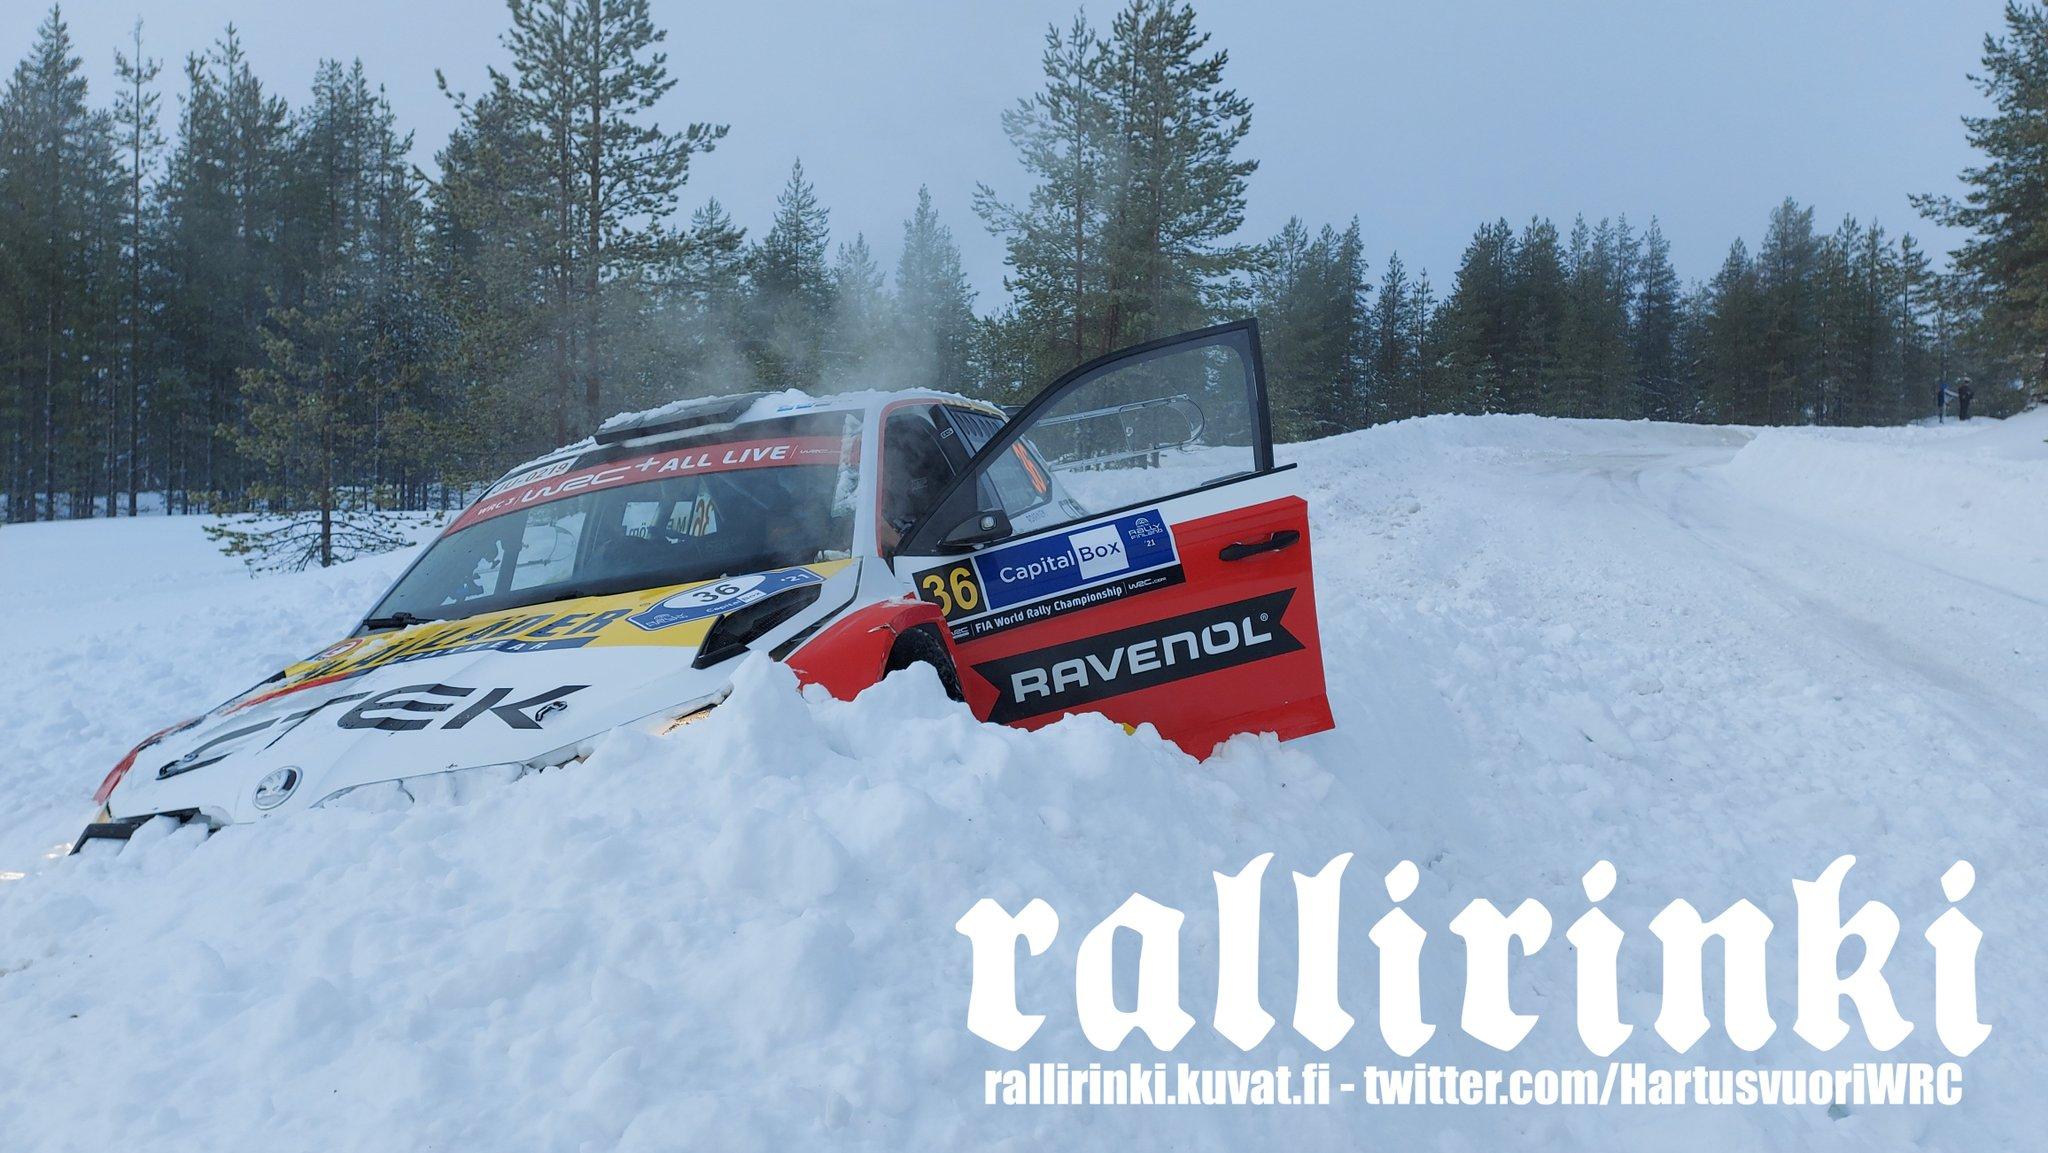 WRC: Arctic Rally Finland - Powered by CapitalBox [26-28 Febrero] - Página 3 EvI2m_UXYAAuztM?format=jpg&name=large